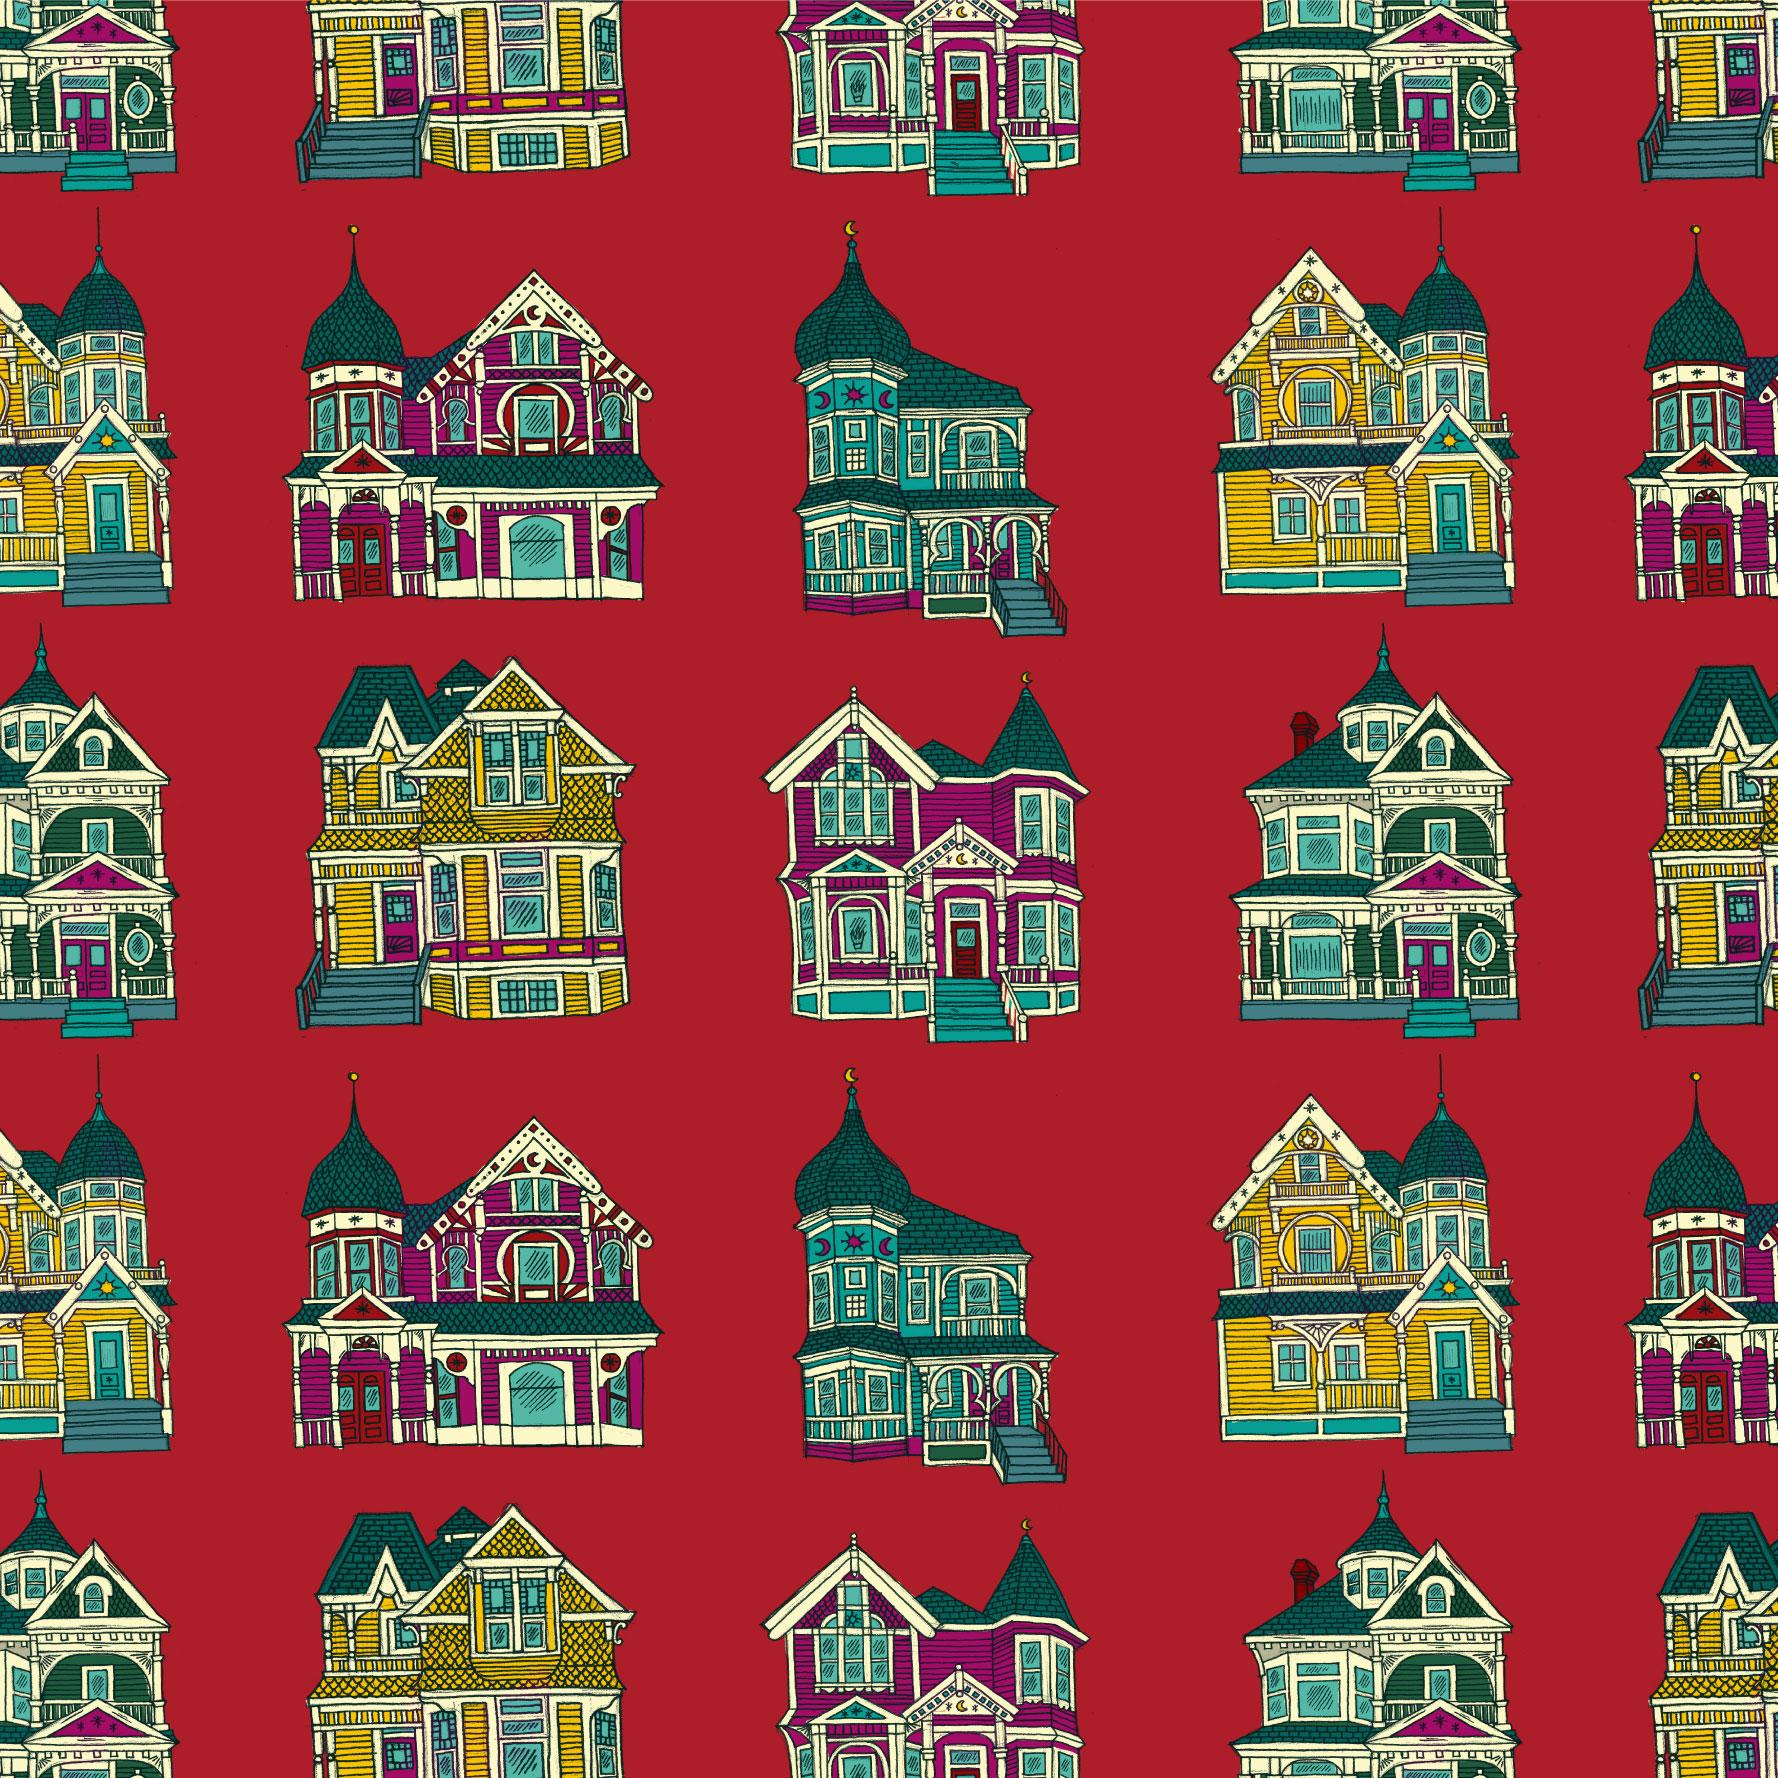 houses-pattern-swatch-6.jpg